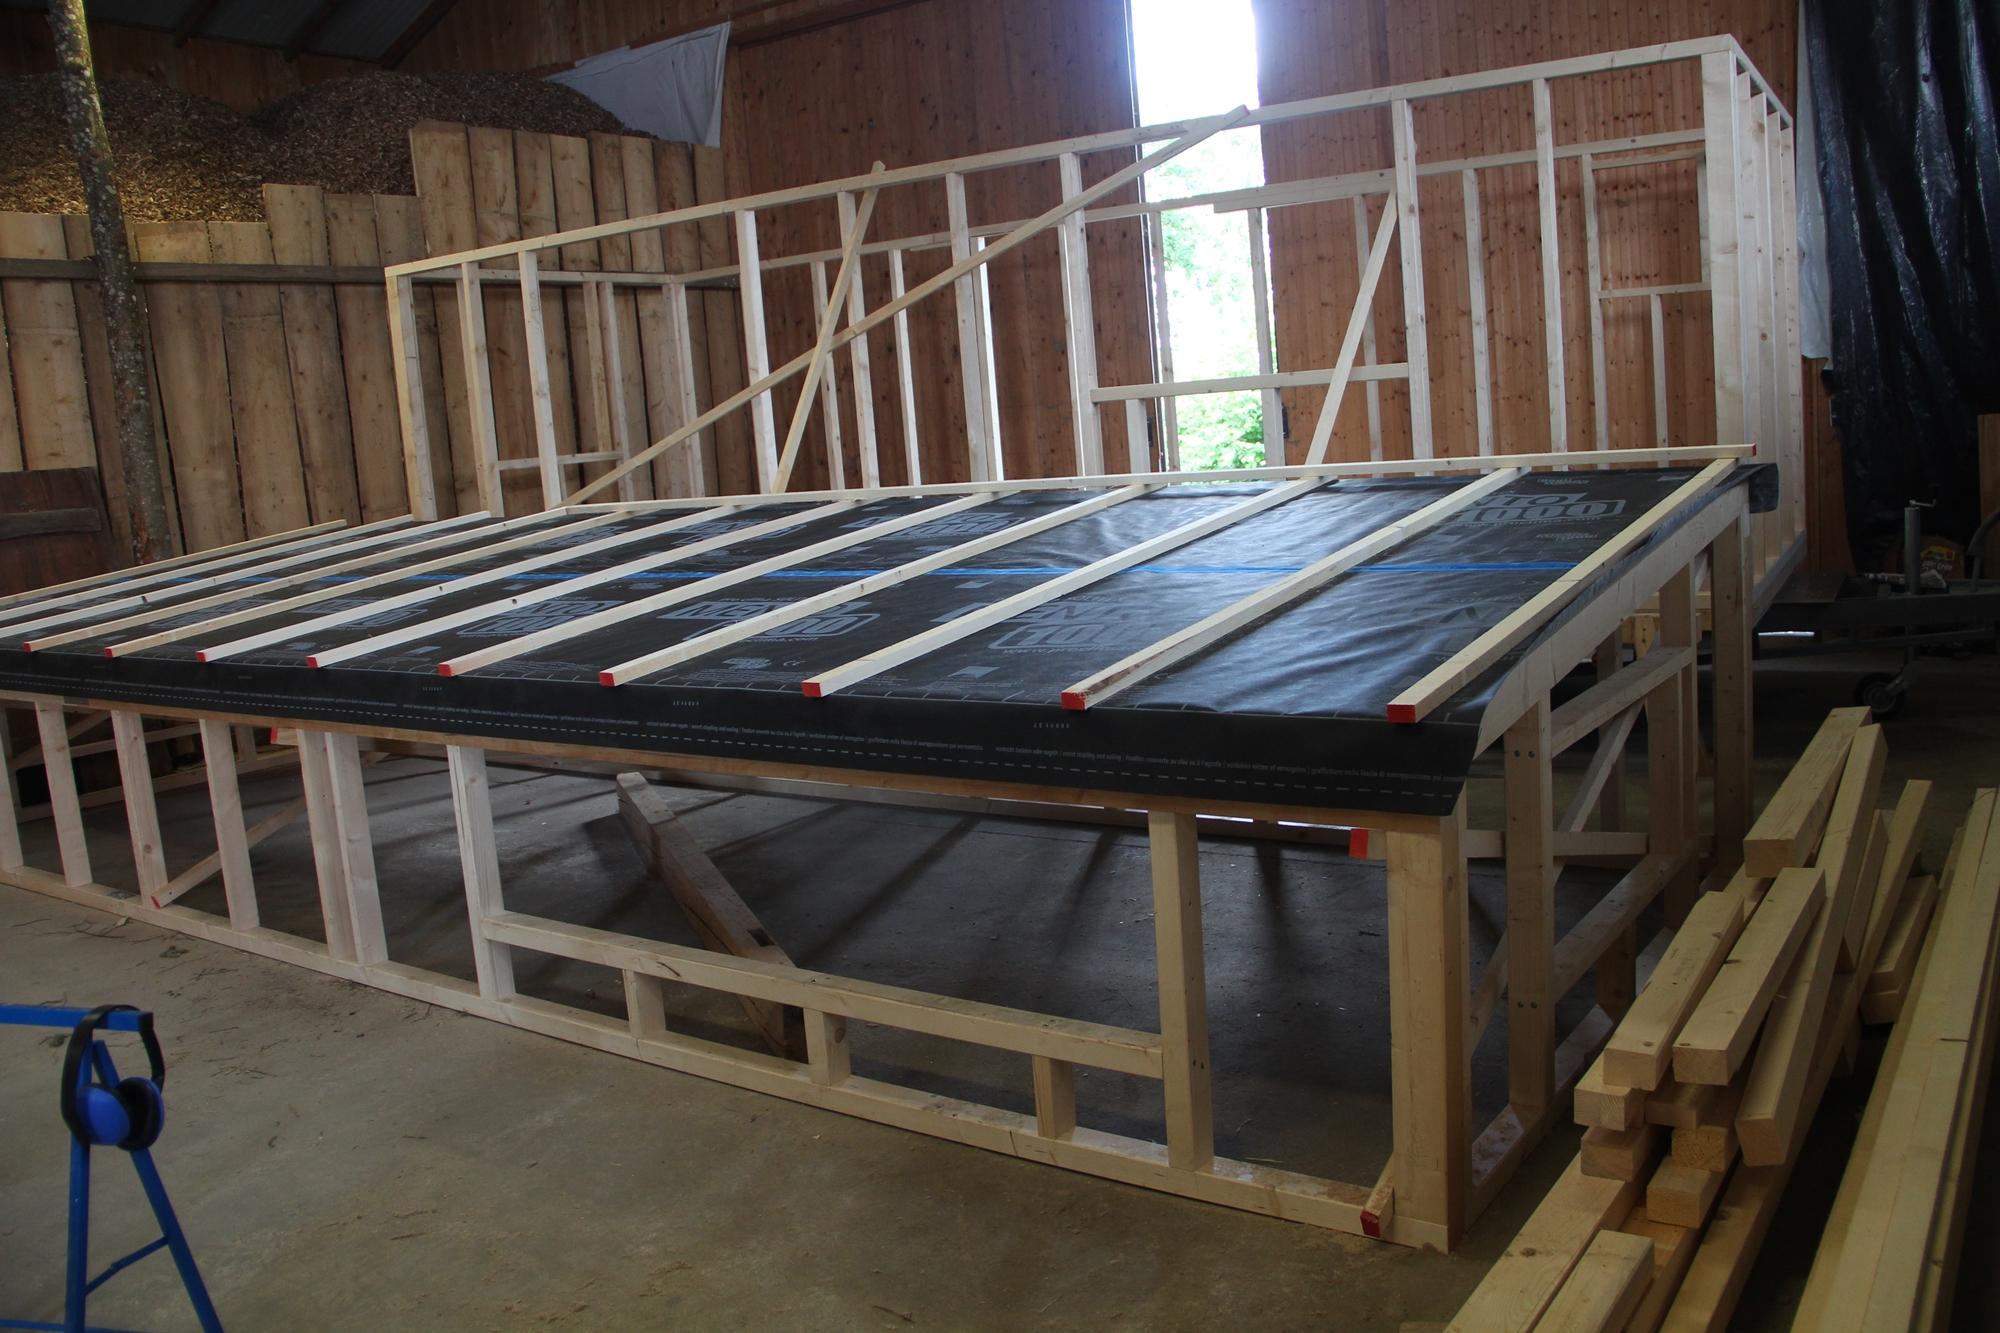 Dachdeckung Teil 1: Holzfaserdämmplatten, Folie, Lattung und Insektenschutz